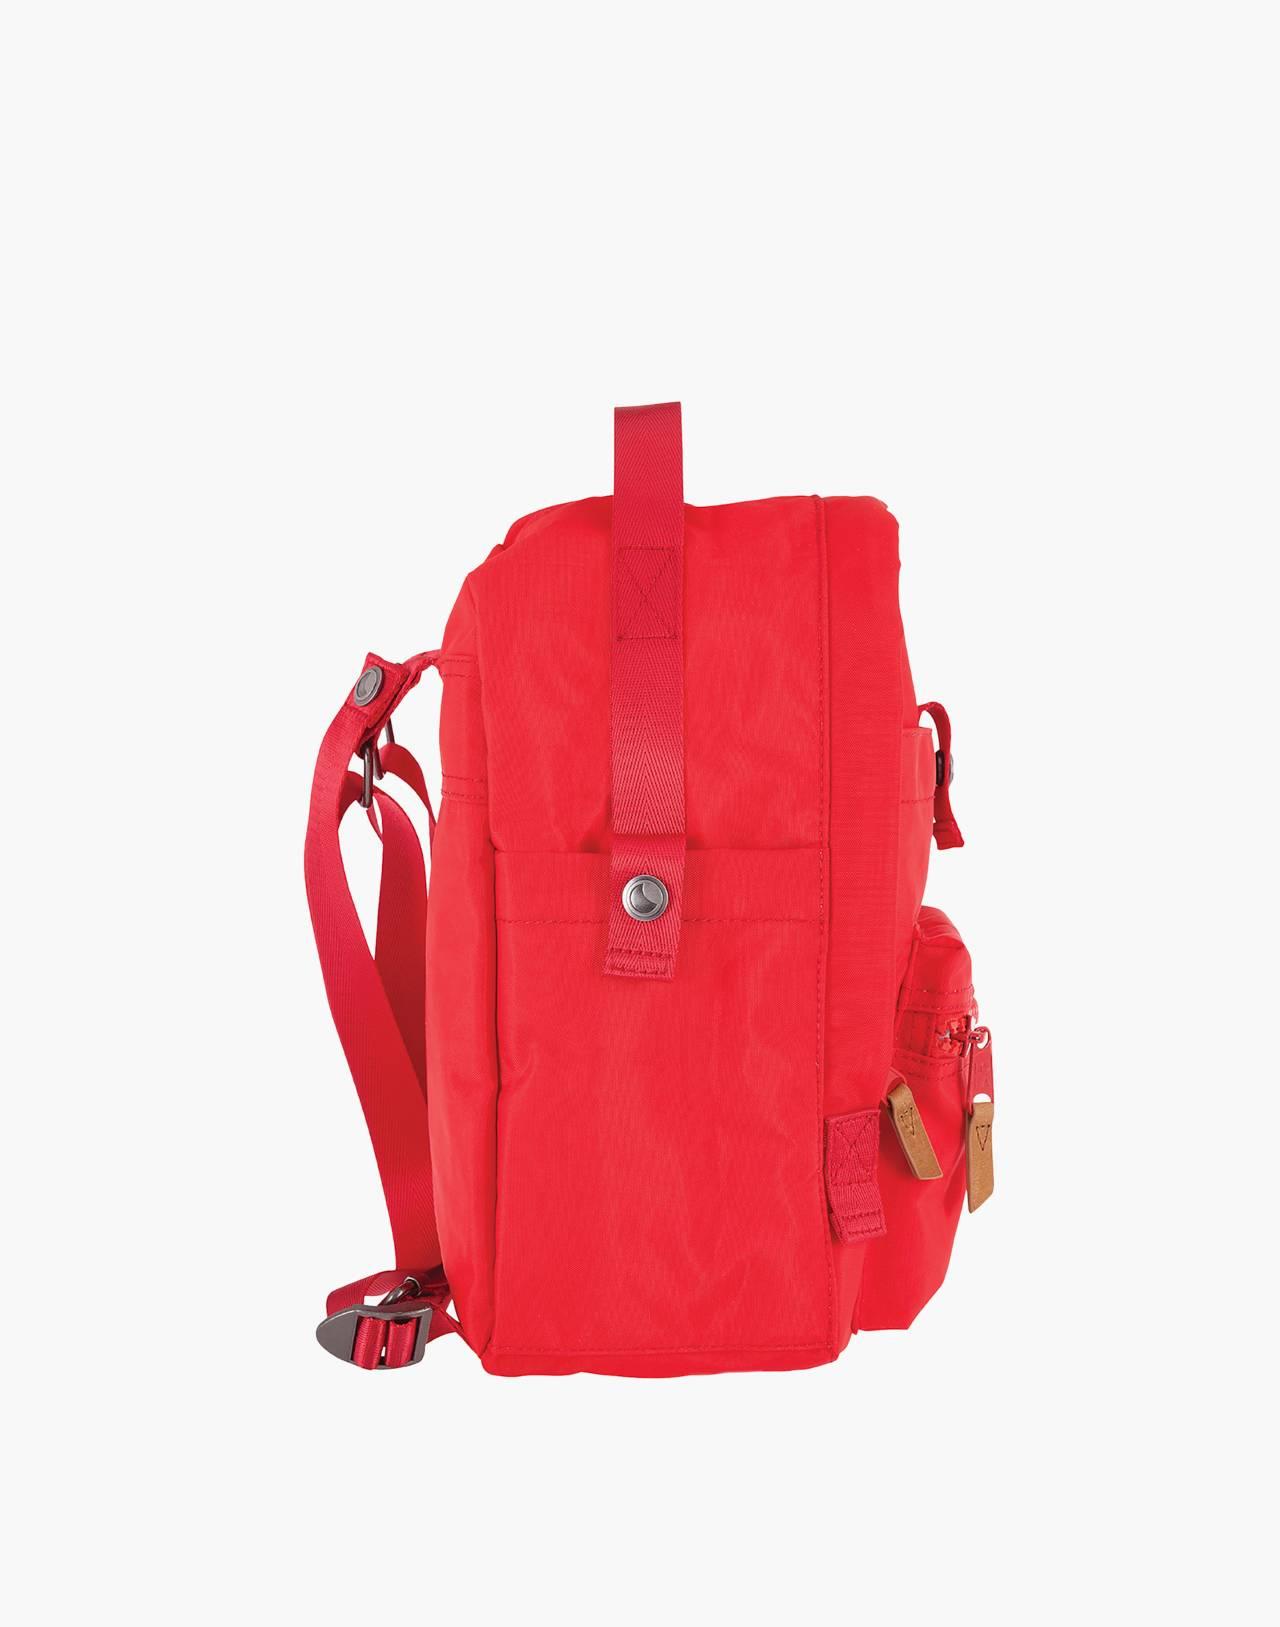 LOLA™ Mondo Utopian Small Backpack in red image 3